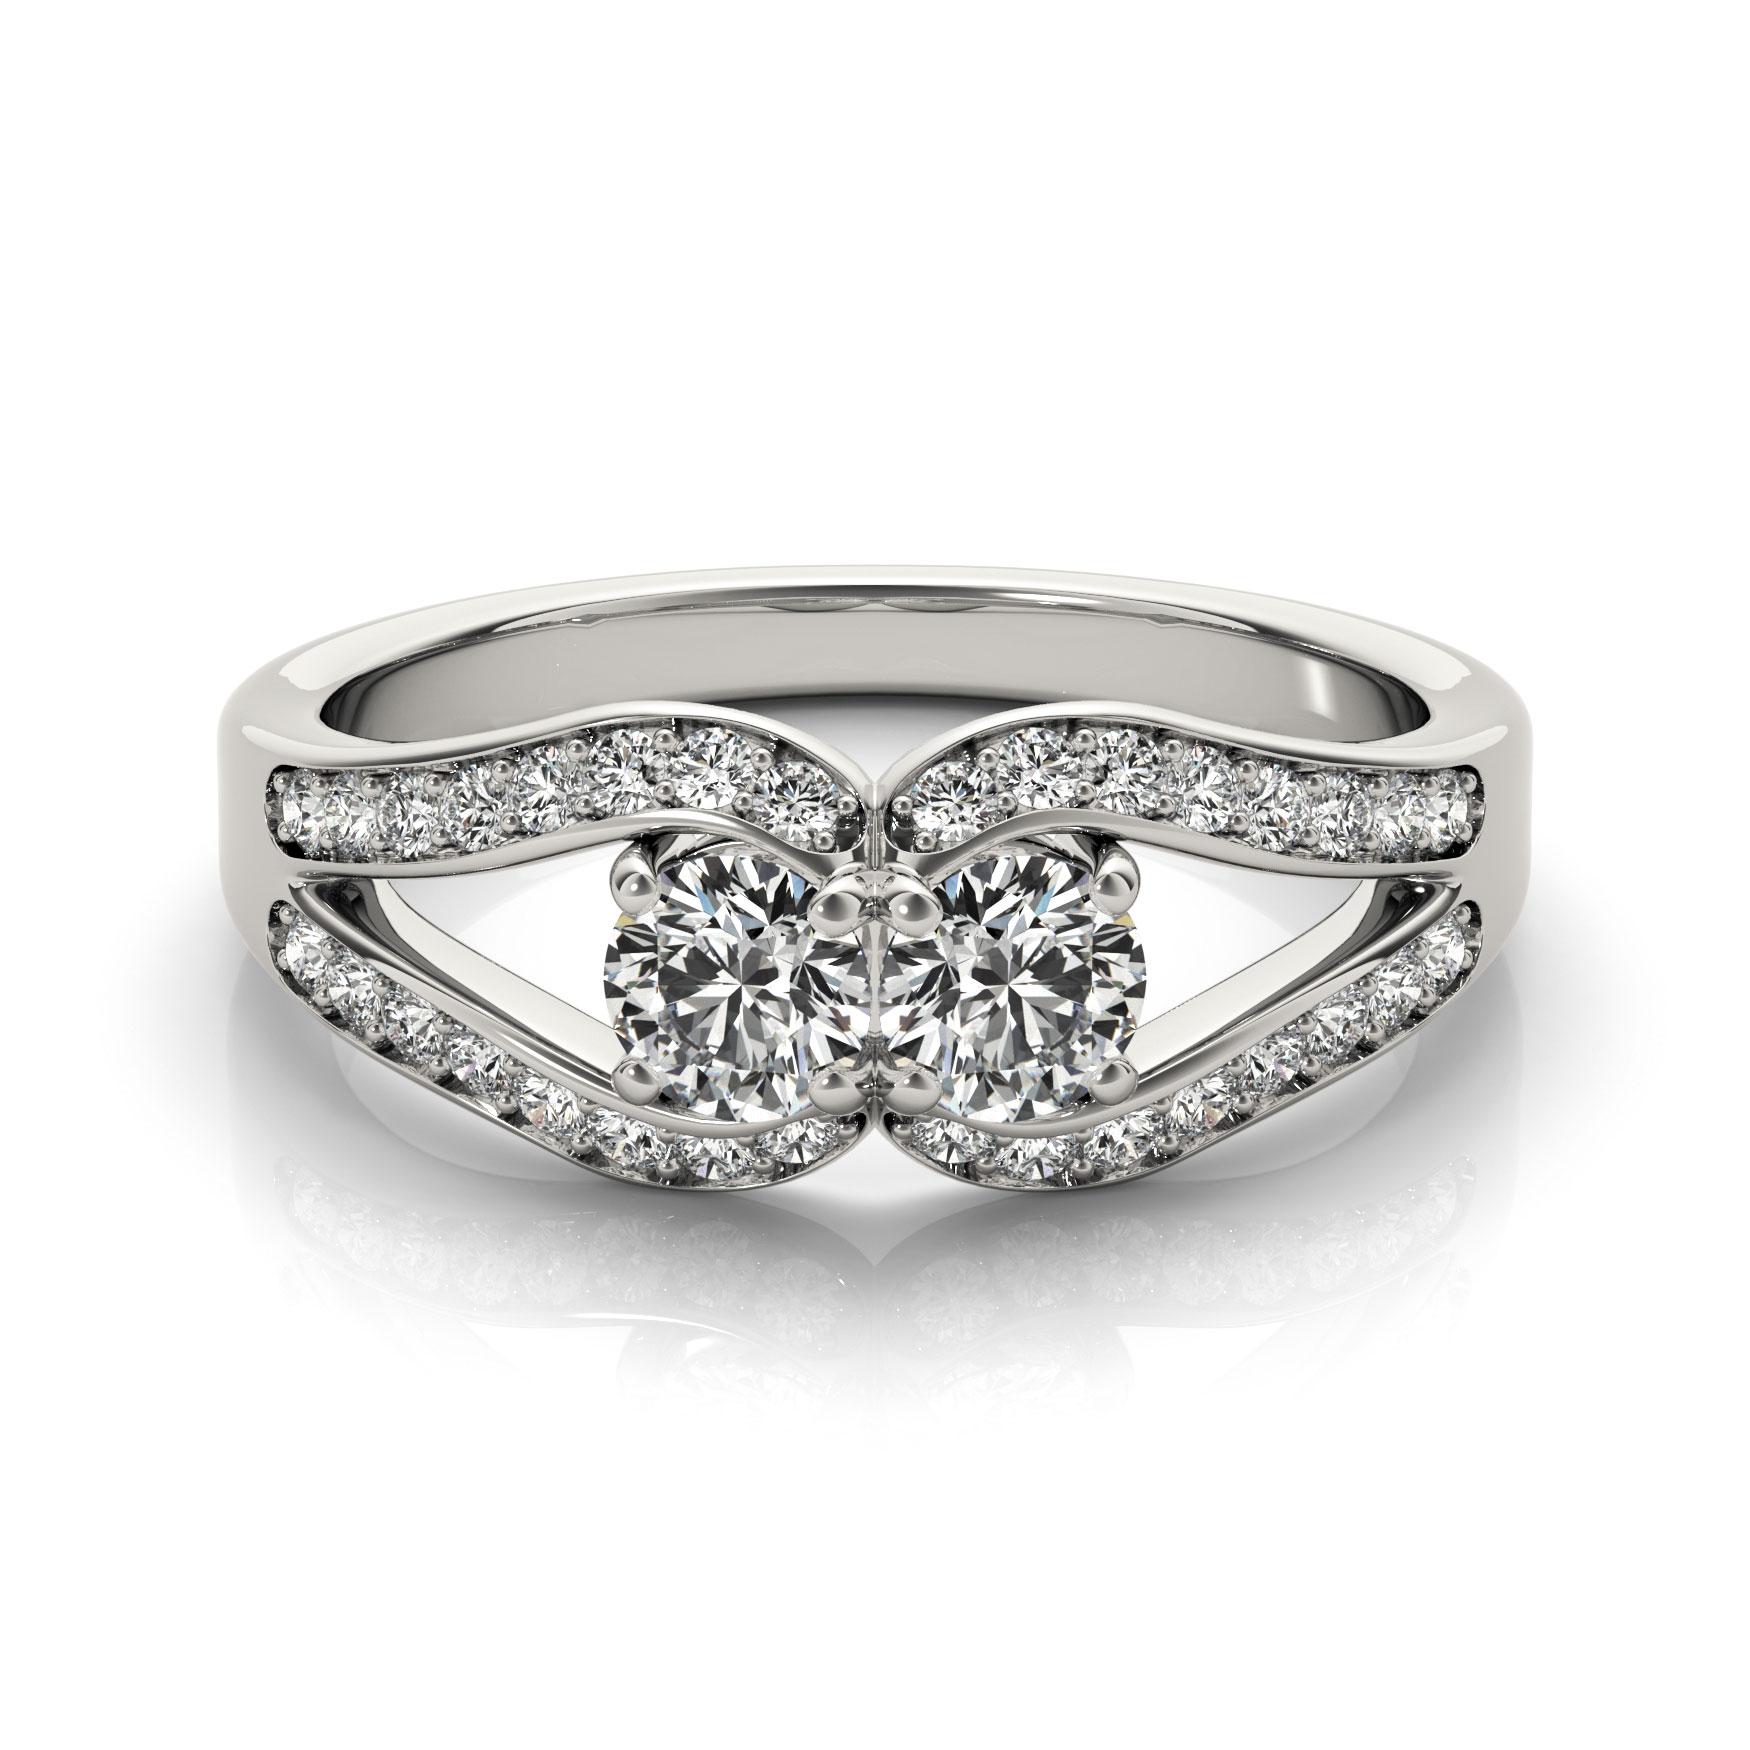 18k-white-gold-two-stone-diamond-engagement-ring-84800-1